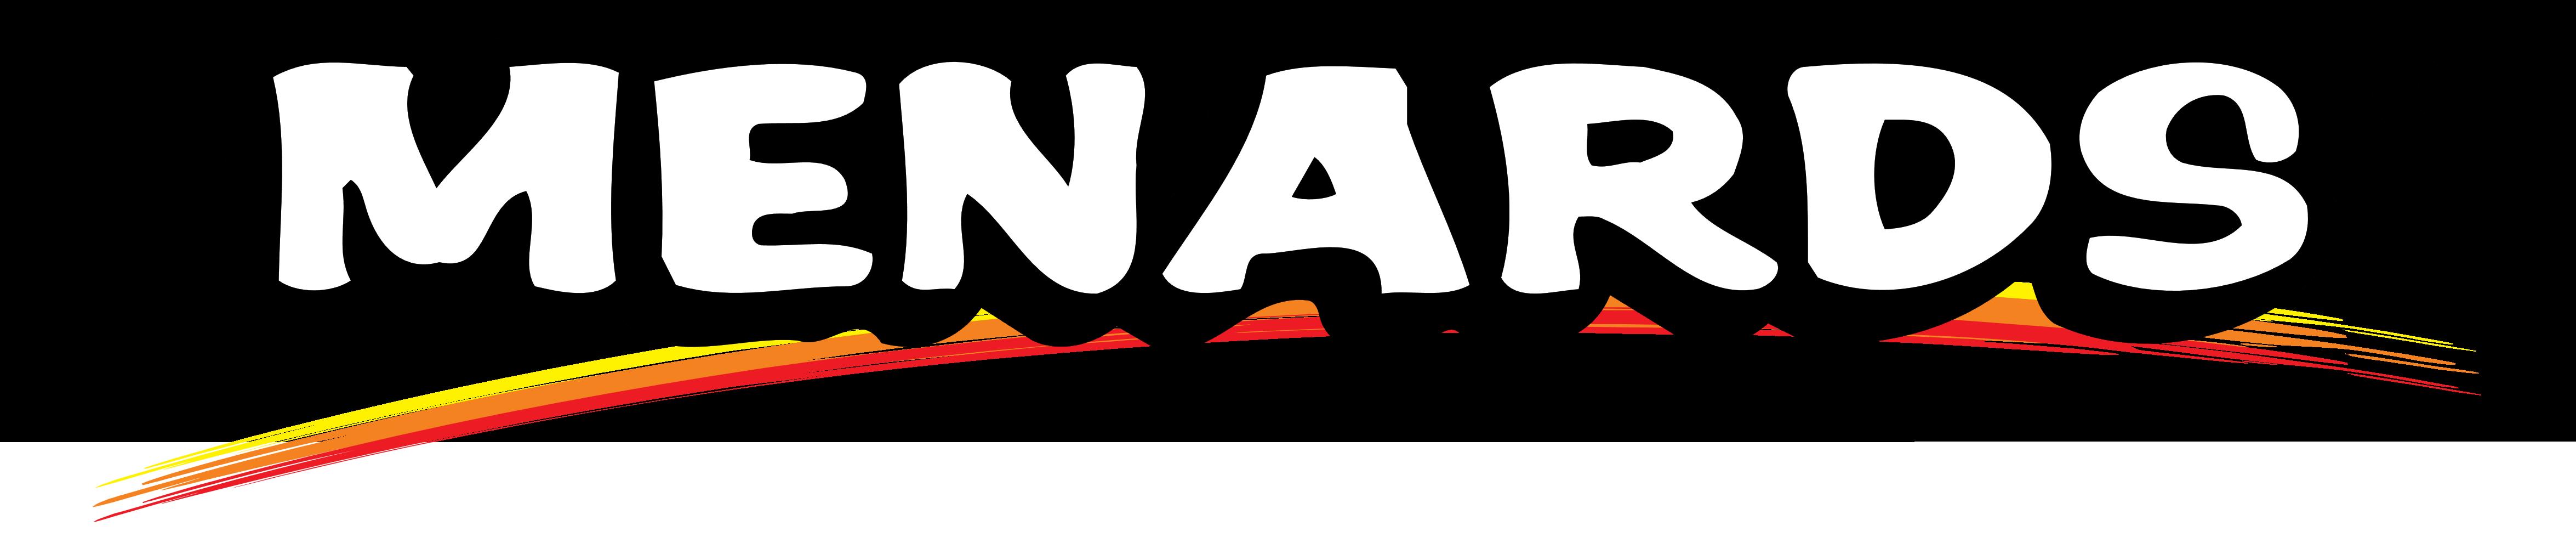 Menards_logo_symbol